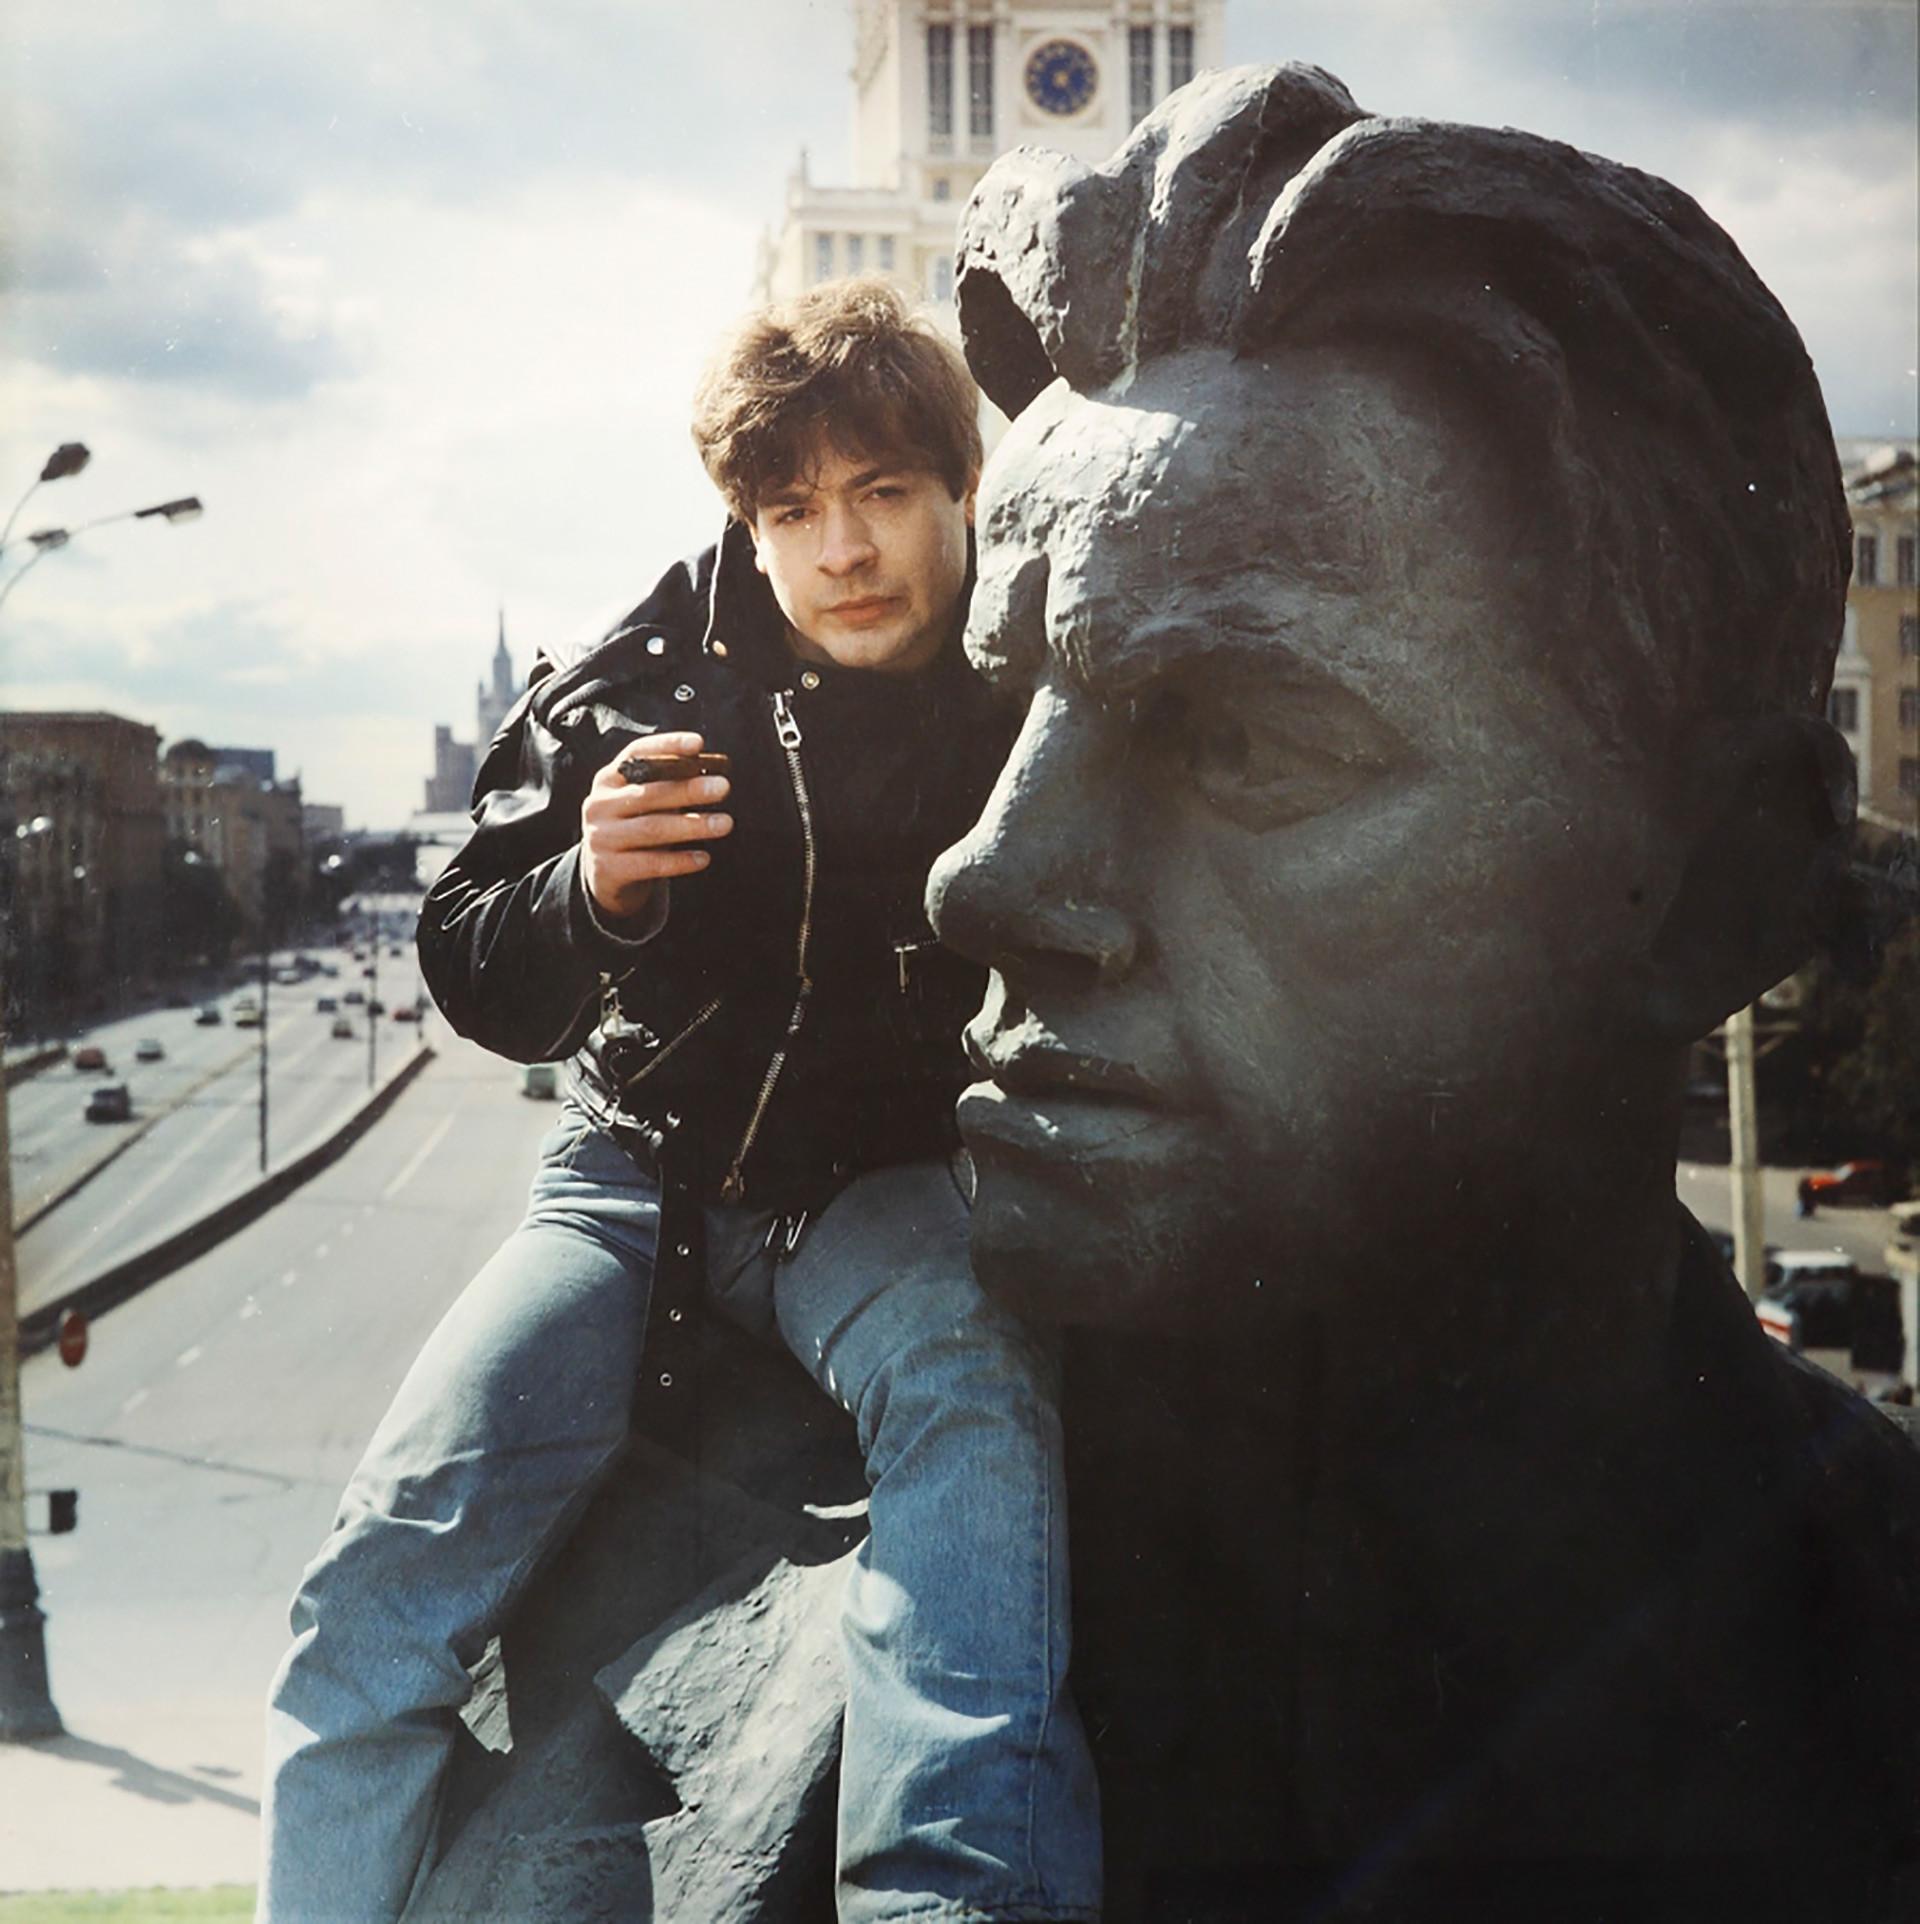 "Anatolij Osmolovskij seduto sul monumento del poeta Vladimir Majakovsksij a Mosca, durante la performance ""Journey of Necesiudik in the land of Brobdingnegs"", del 1993"